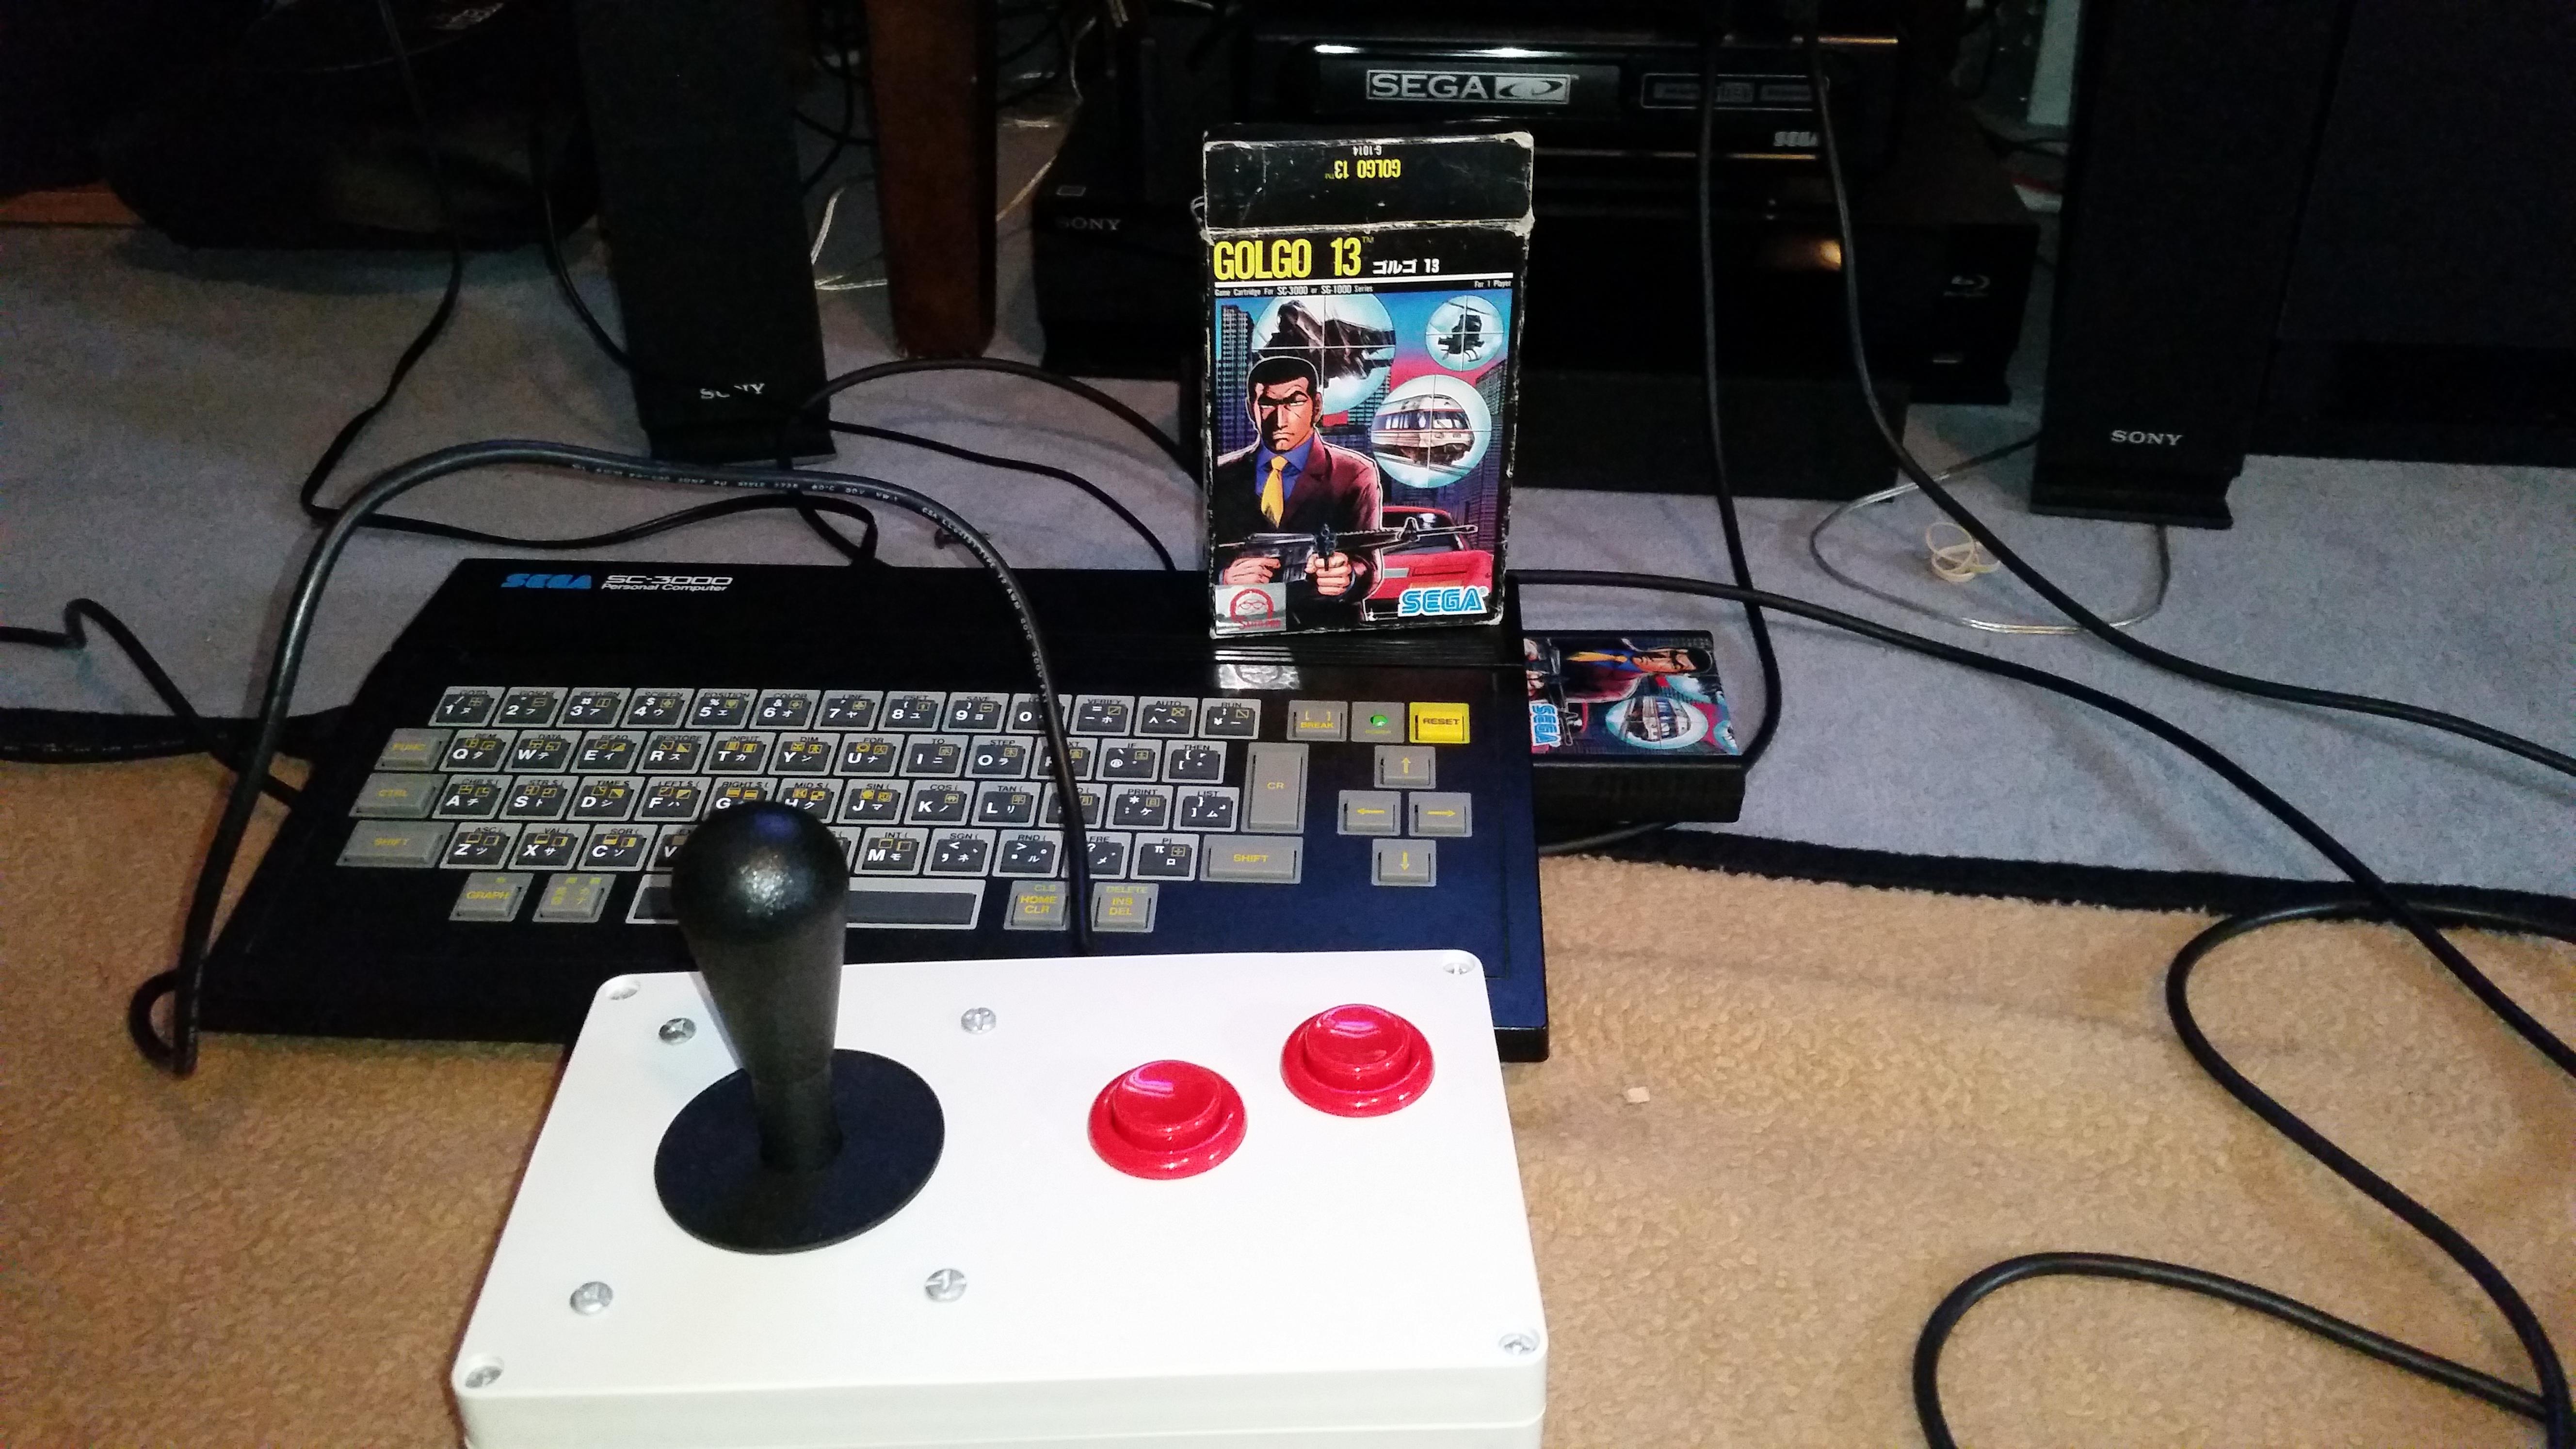 RedMage: Golgo 13 (Sega SG-1000) 55,950 points on 2017-08-31 10:47:38